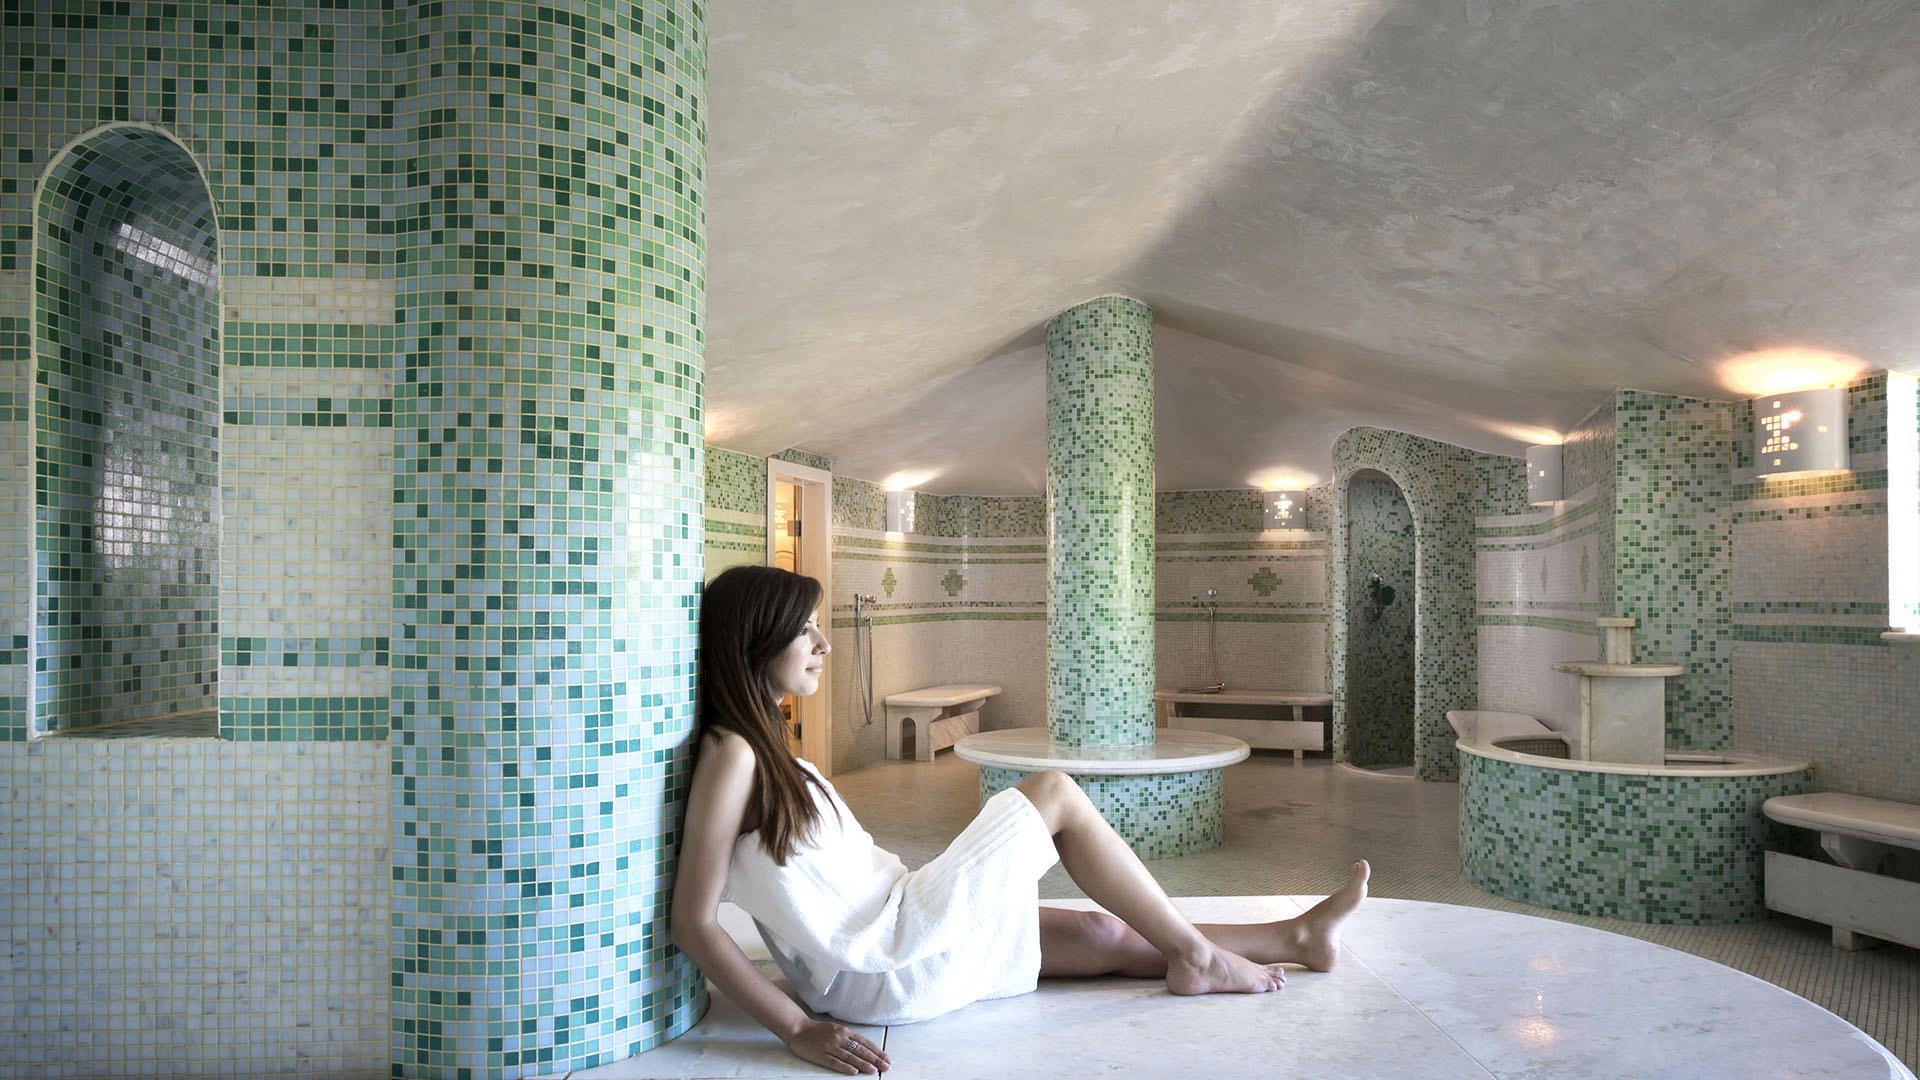 hotel-marinedda-thalasso-bagno-turco-sardegna-isola-rossa